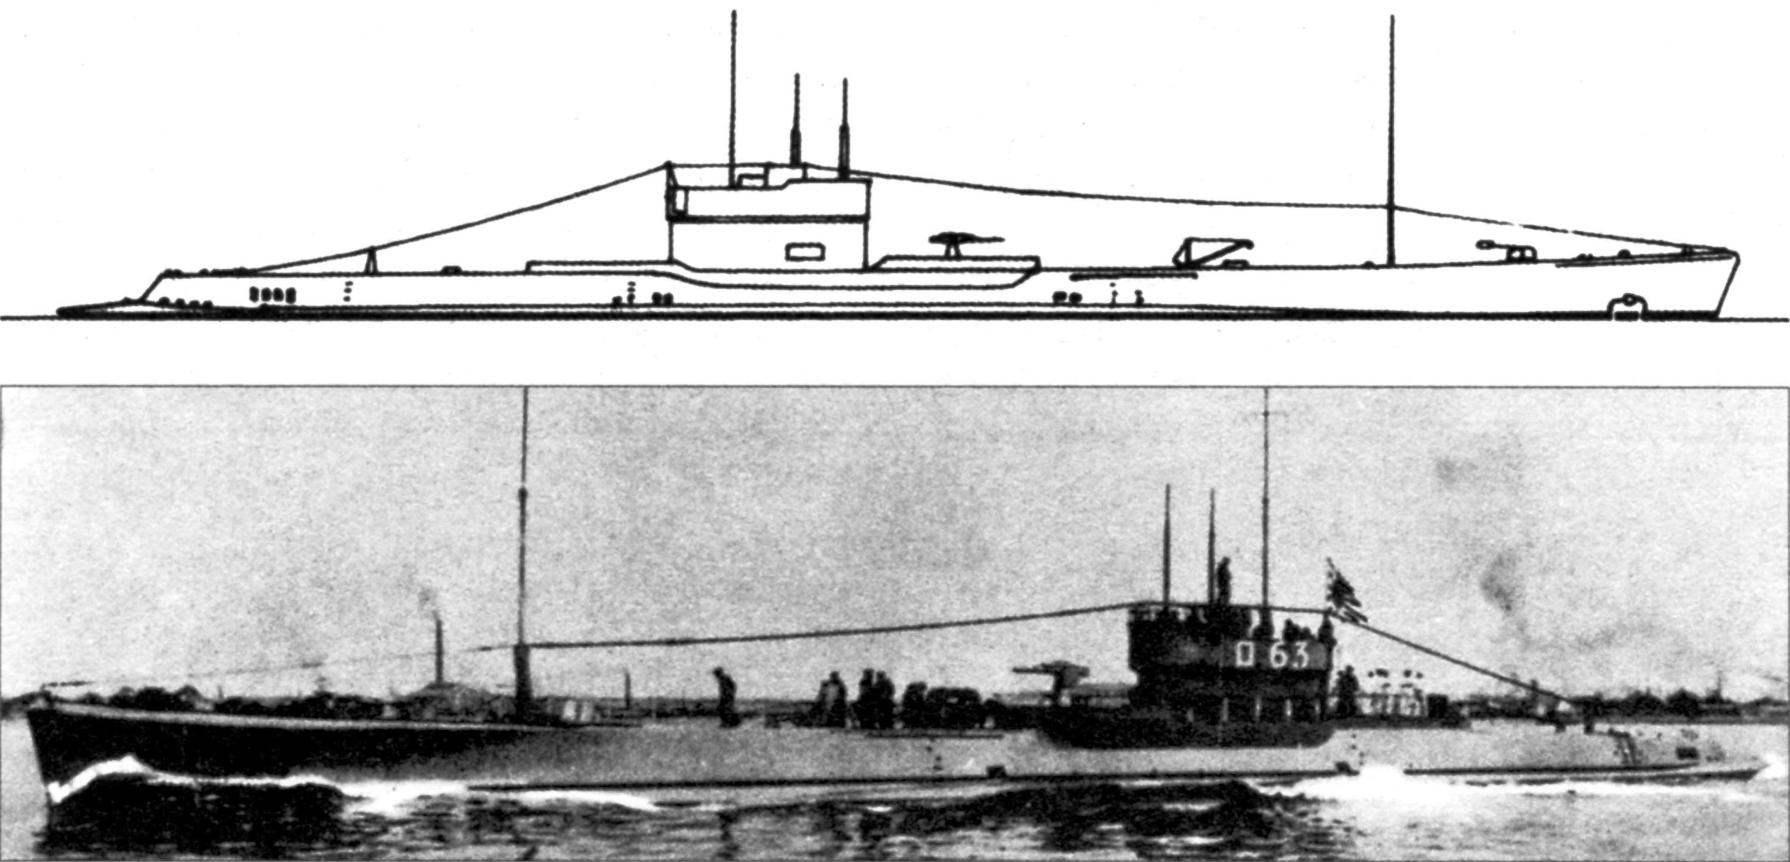 Подводная лодка №85 («RO-63») типа «L-4», Япония, 1925 г.